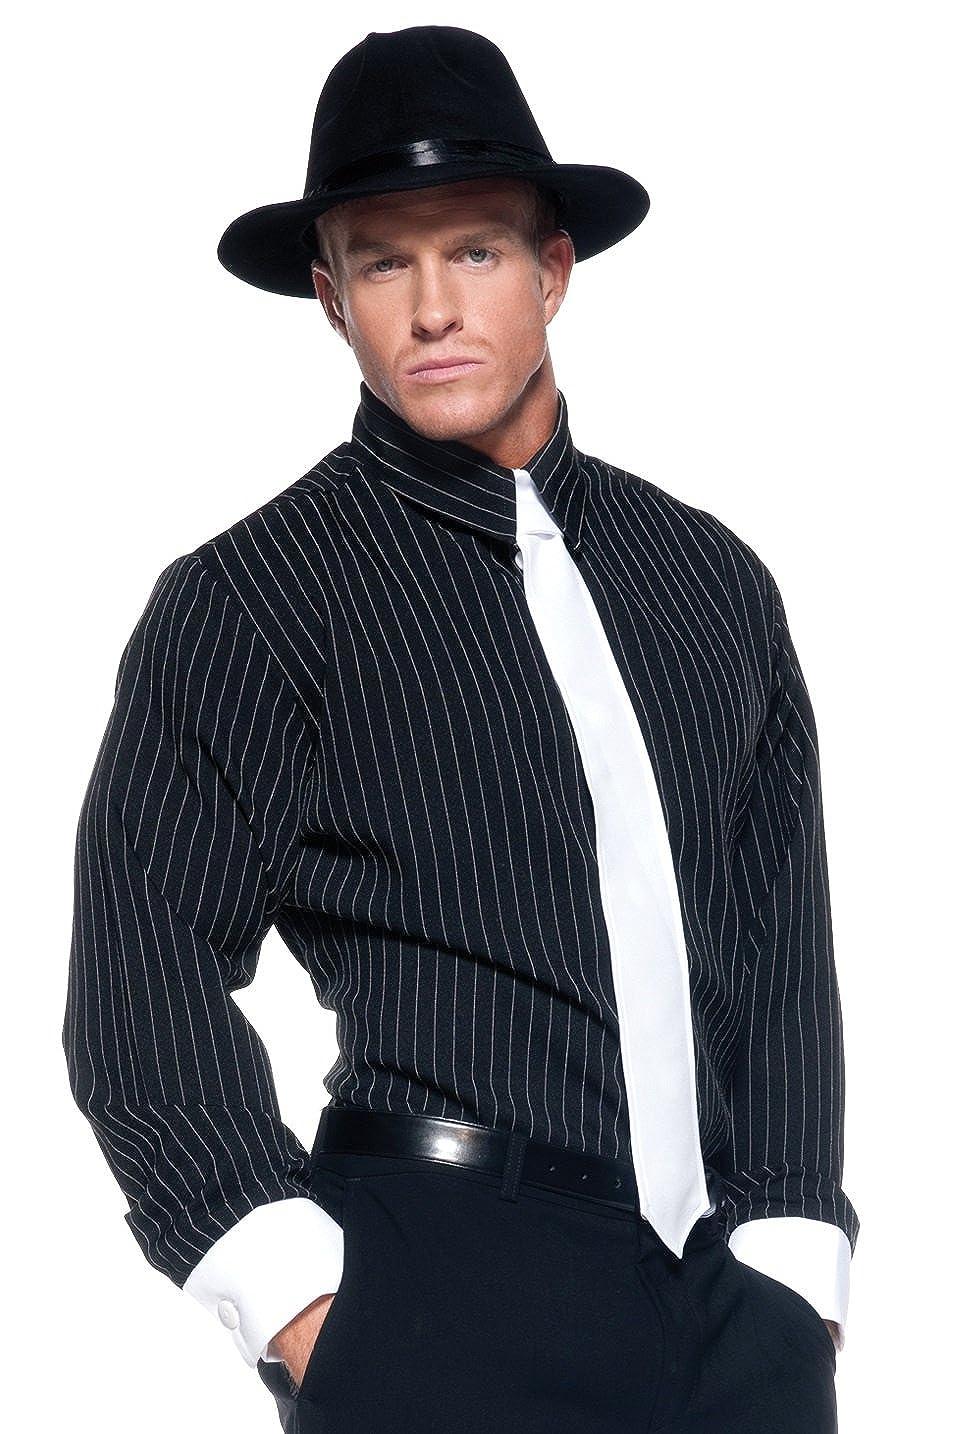 Striped Shirt Mens Mobster Costume